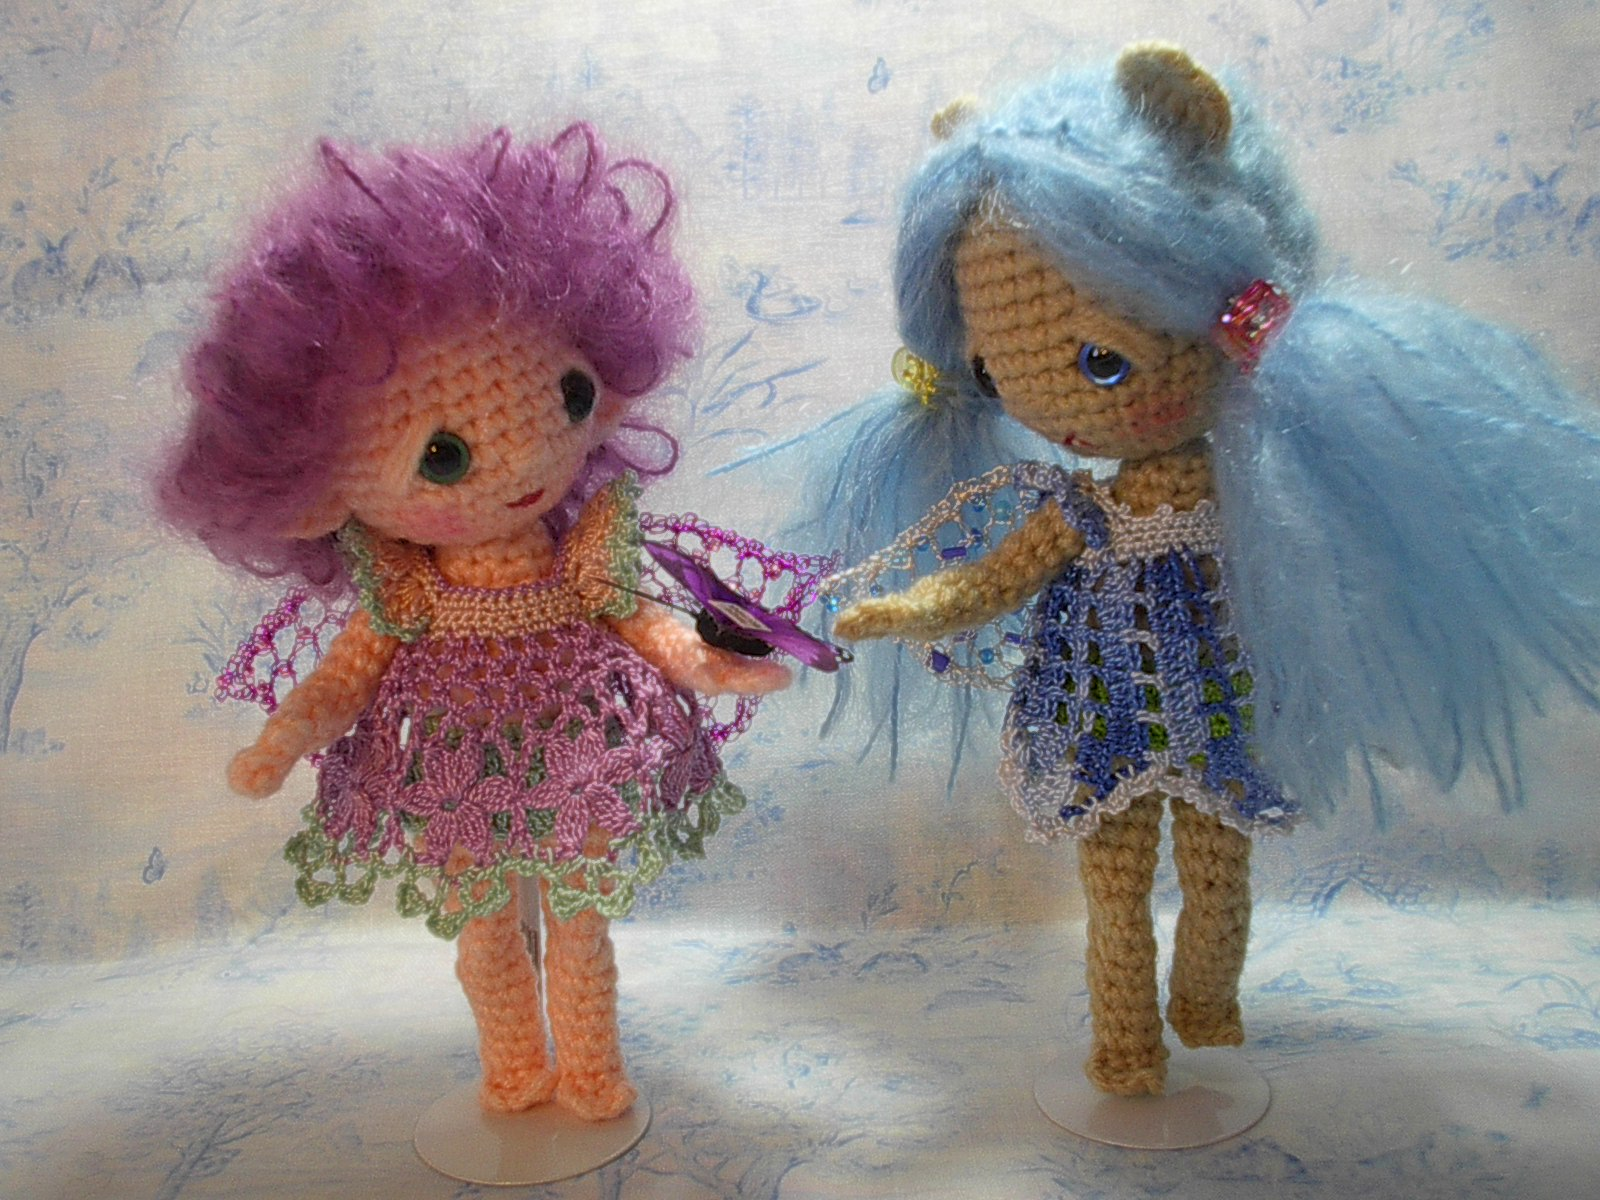 Amigurumi Doll Patterns : Ravelry crochet amigurumi doll pattern by anat tzach